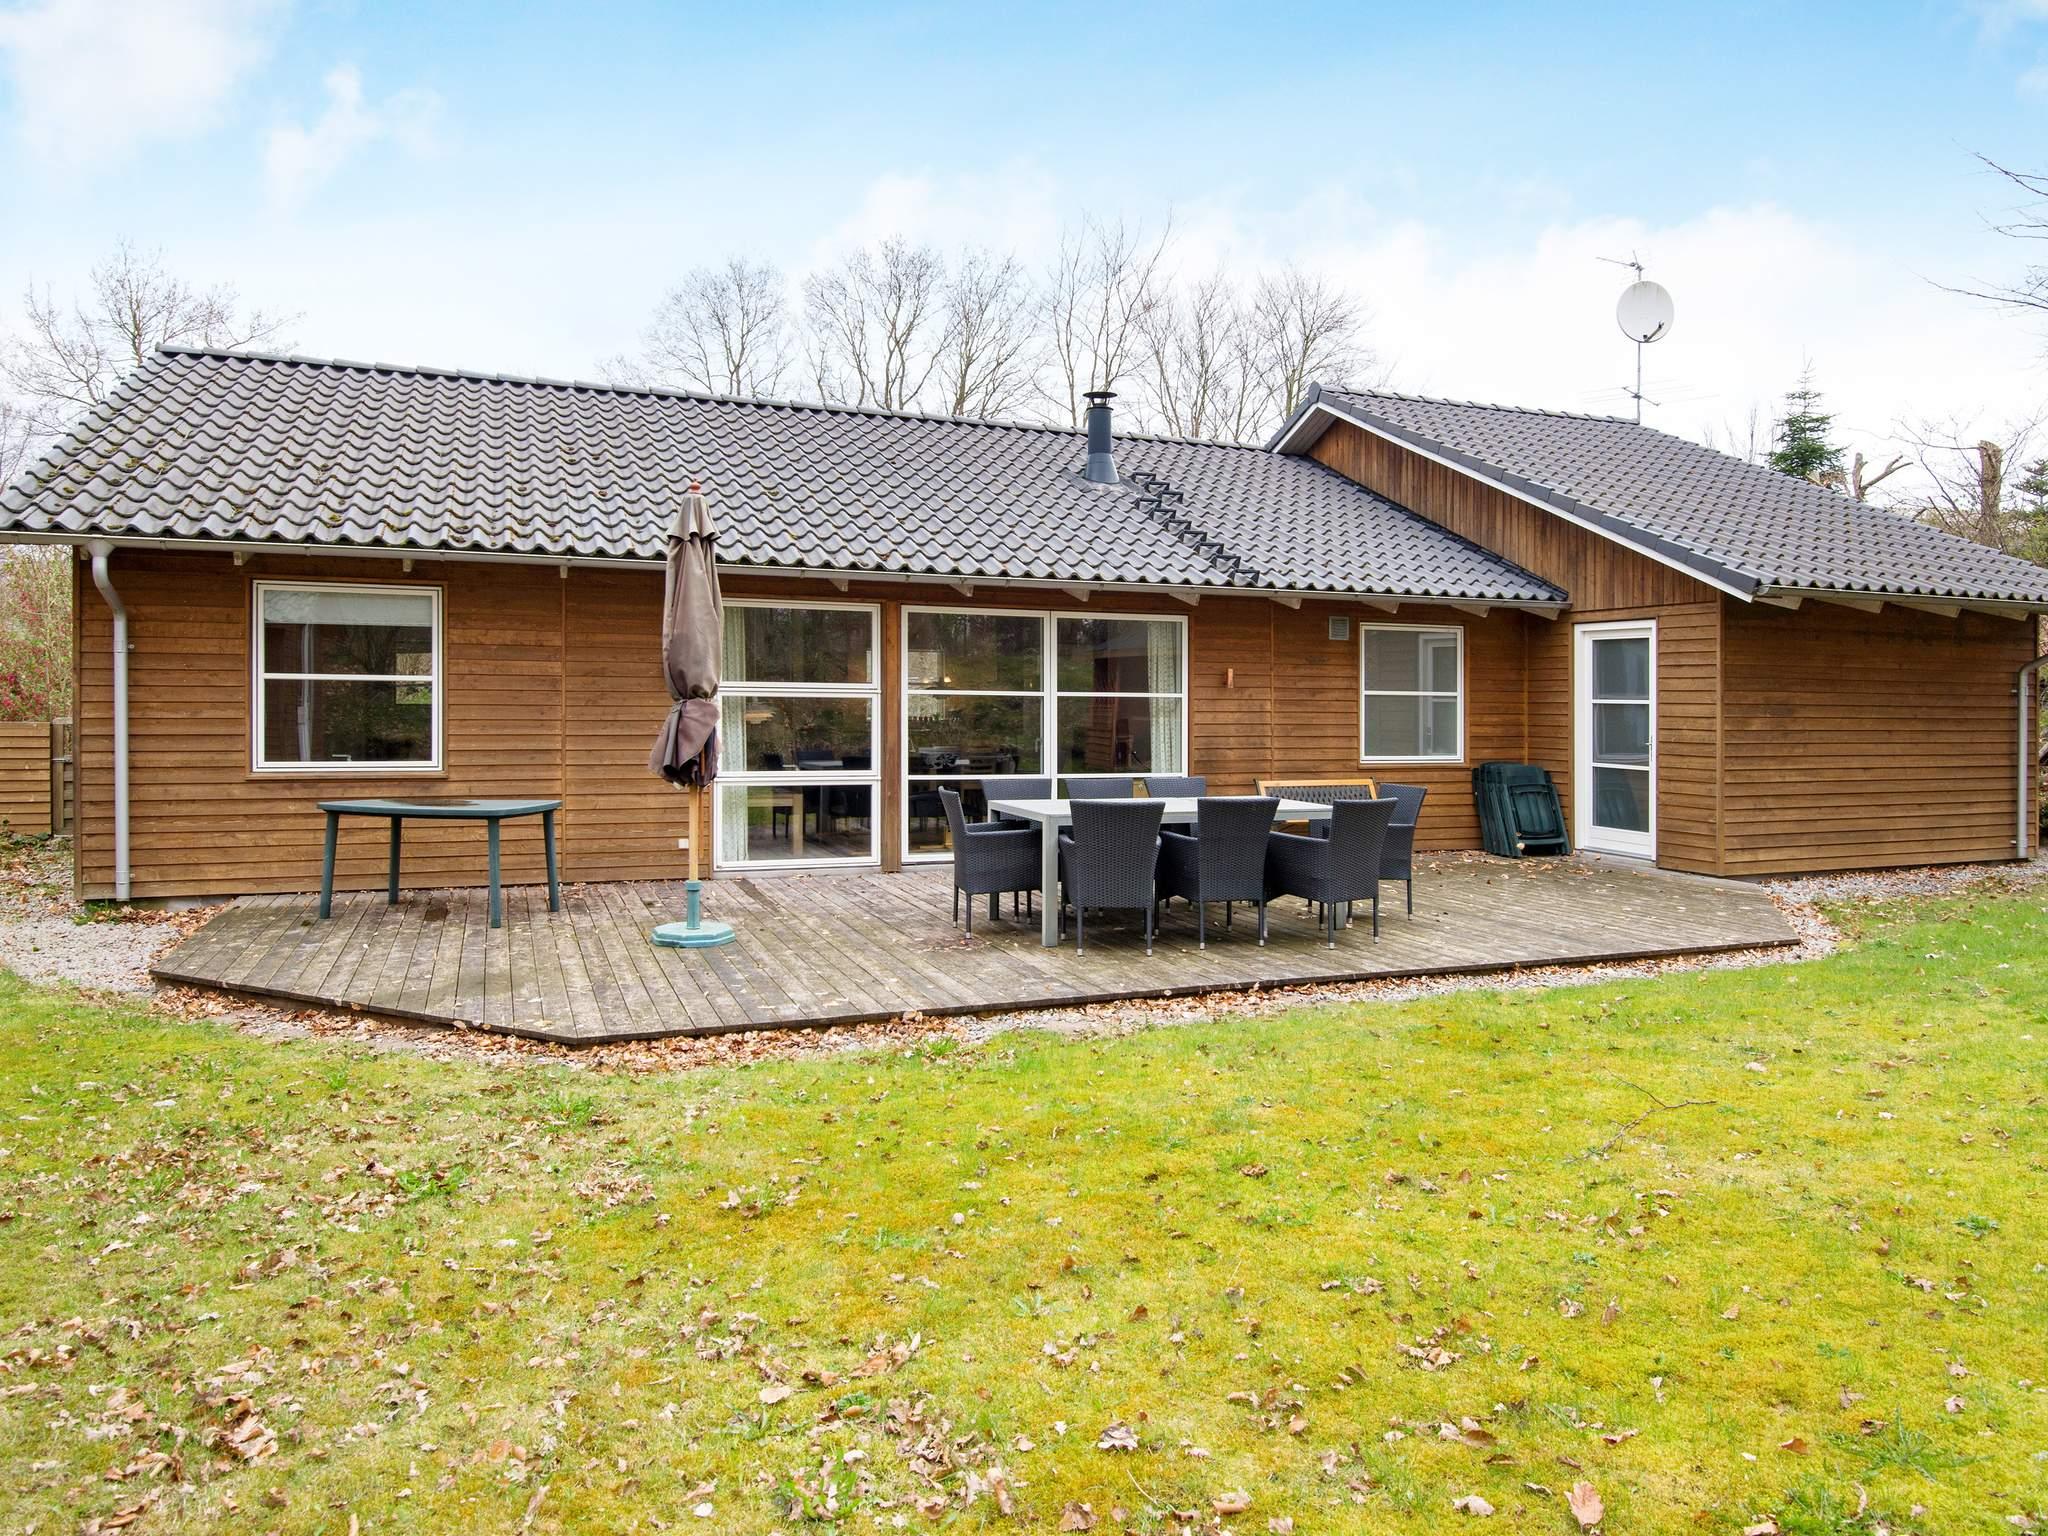 Ferienhaus Fjellerup Strand (315966), Fjellerup, , Ostjütland, Dänemark, Bild 21